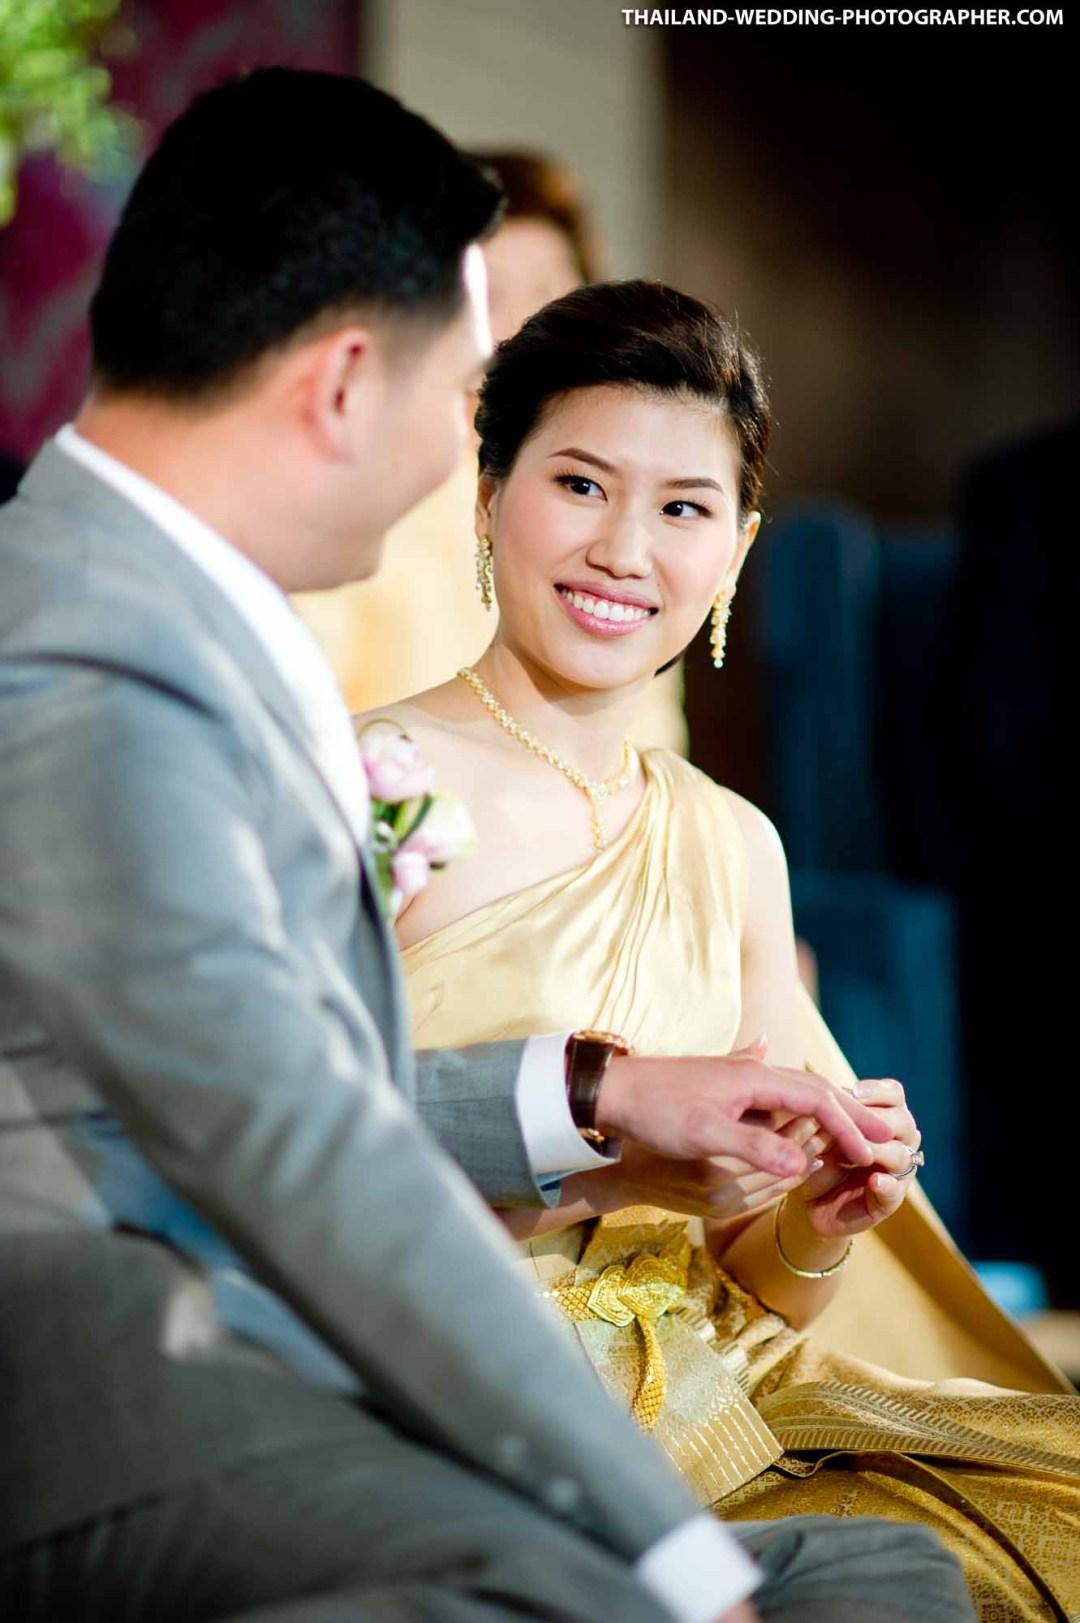 The St. Regis Bangkok Thailand Wedding Photography